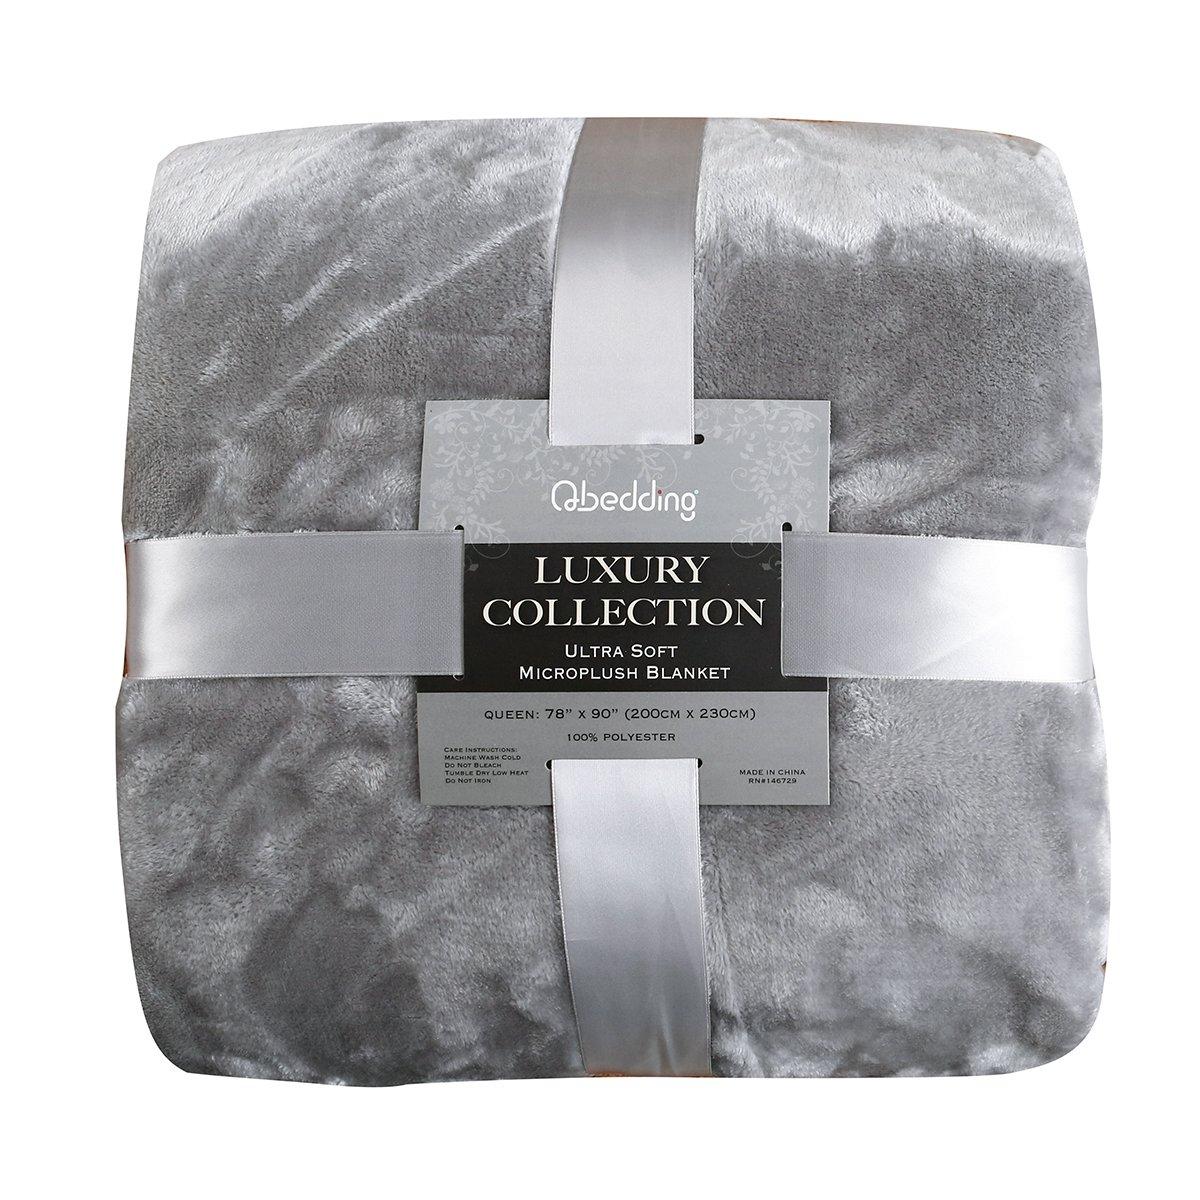 Qbedding Inc. Luxury Collection Ultra Soft Plush Lightweight All-Season Throw/Bed Blanket, King, Gray